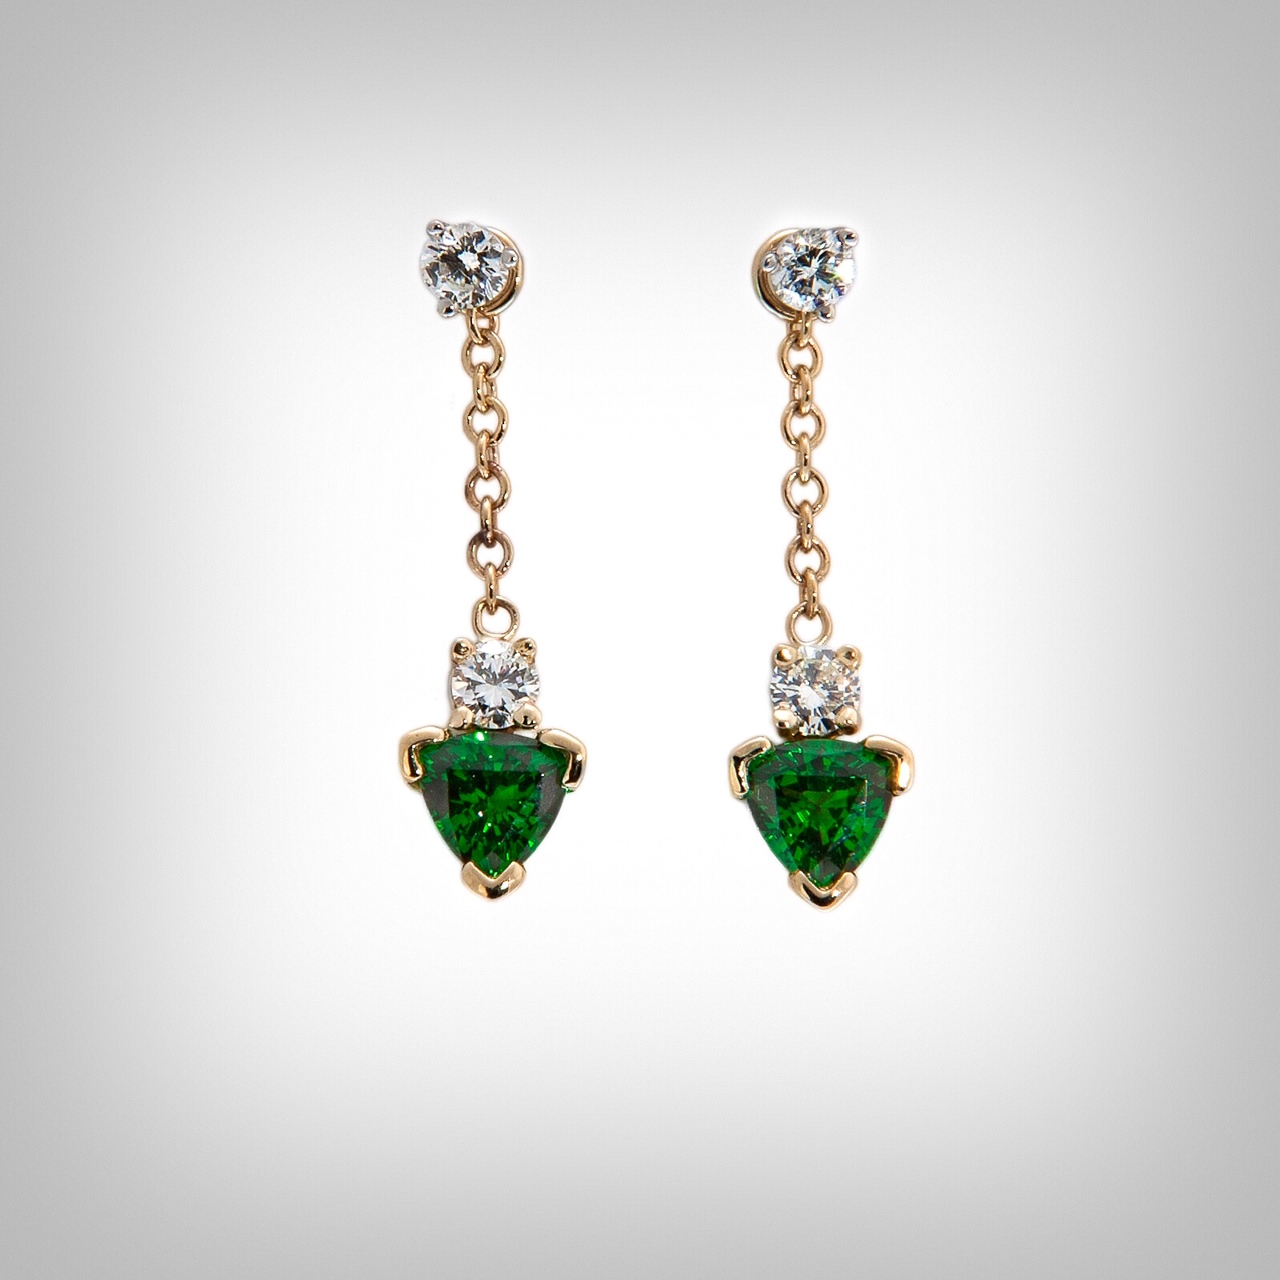 Tsavorite garnet and diamond drop earrings